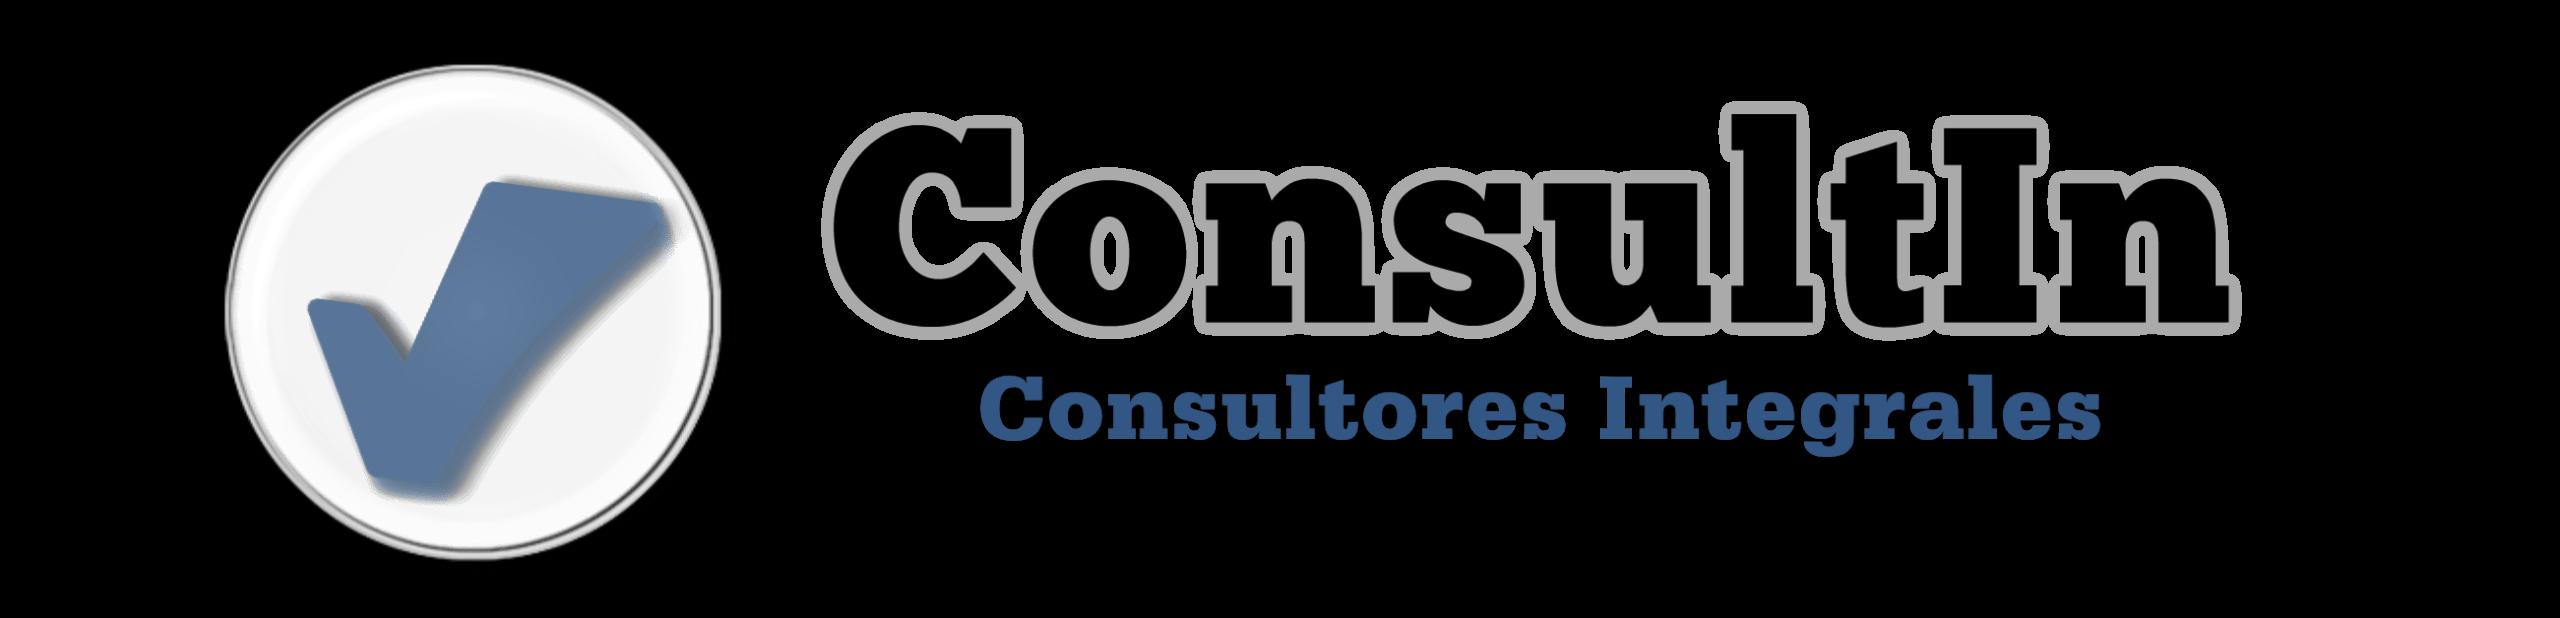 Inmobiliaria en Manresa | pisos en Manresa | Asesoria Integral | Consultin